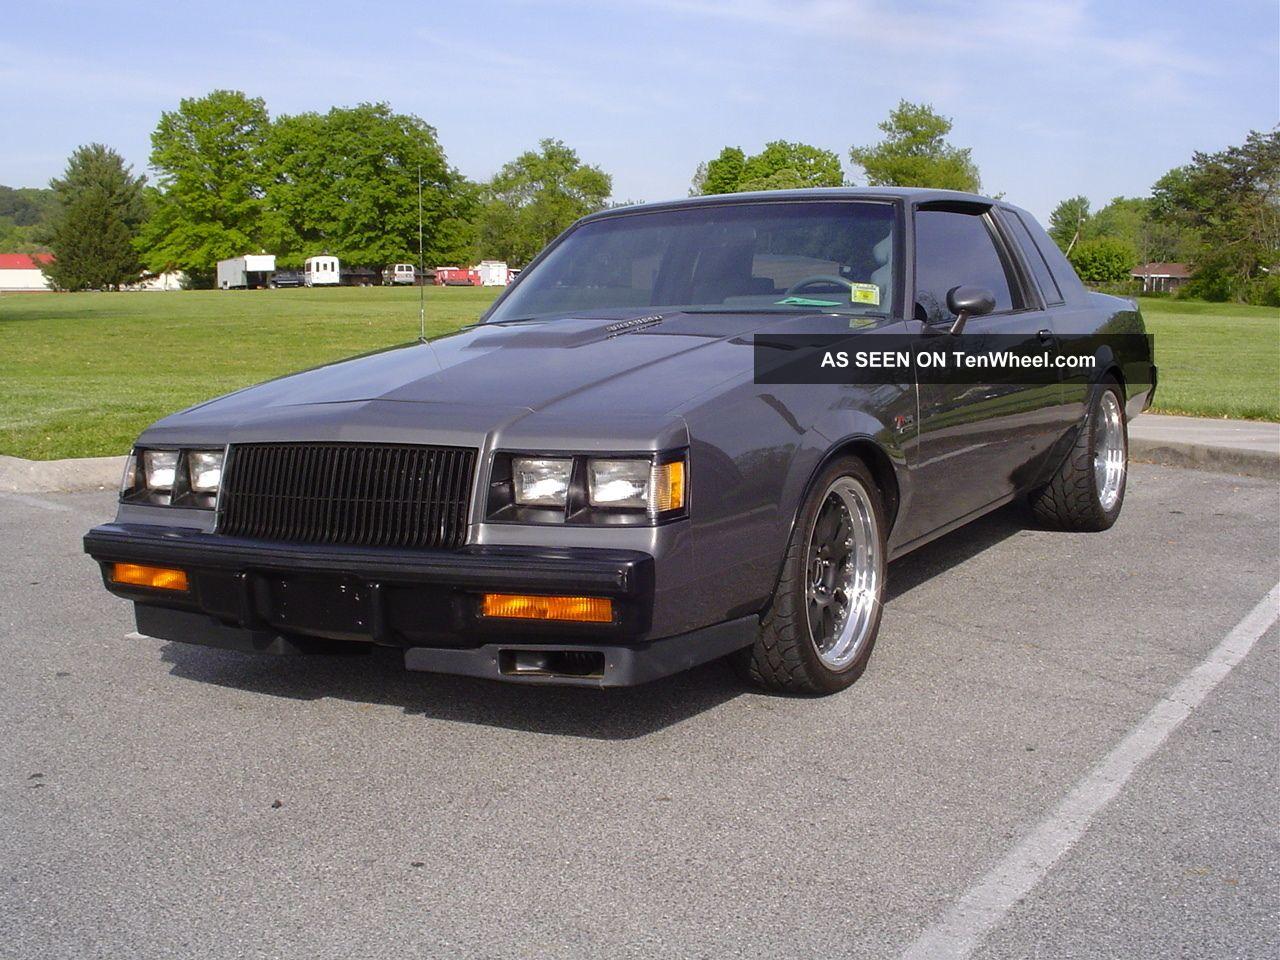 1986 Buick Regal Gray T Type Turbo Coupe Hot Rod 500+ Hp,  603 Rw Torque Regal photo